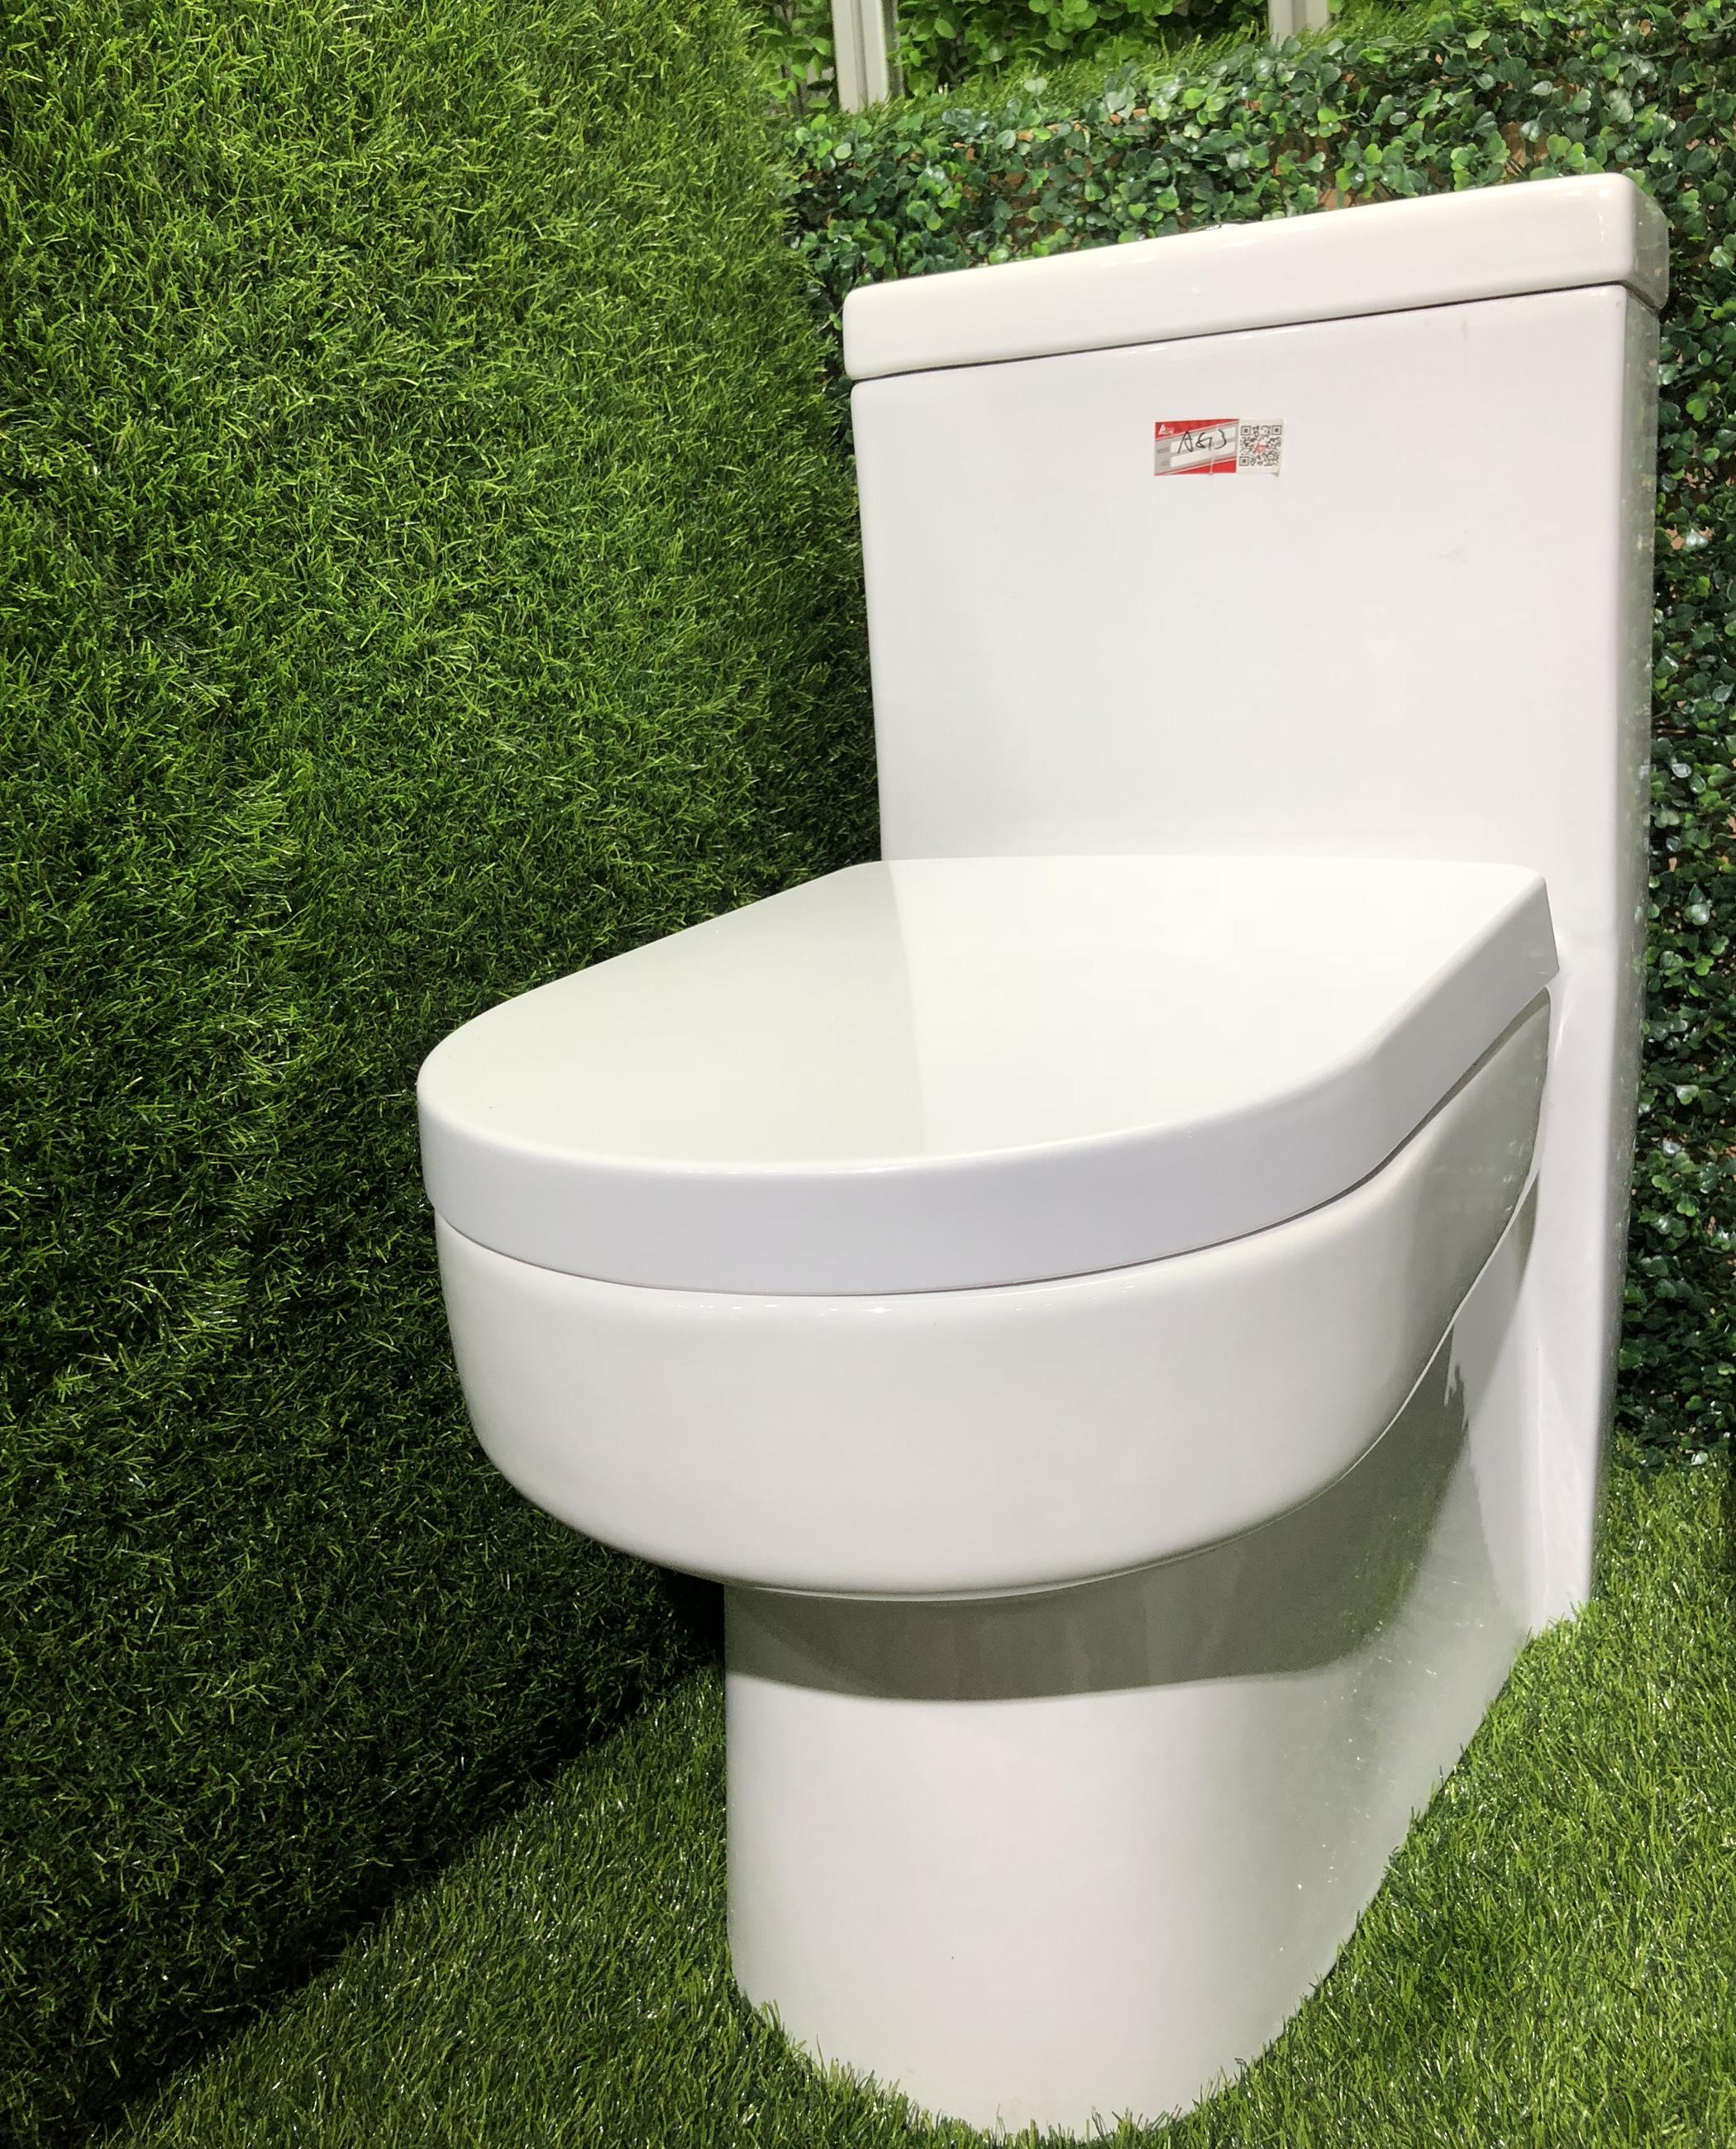 A-6813 ceramic toilet sanitary ware wc toilets one piece closet popular toilets